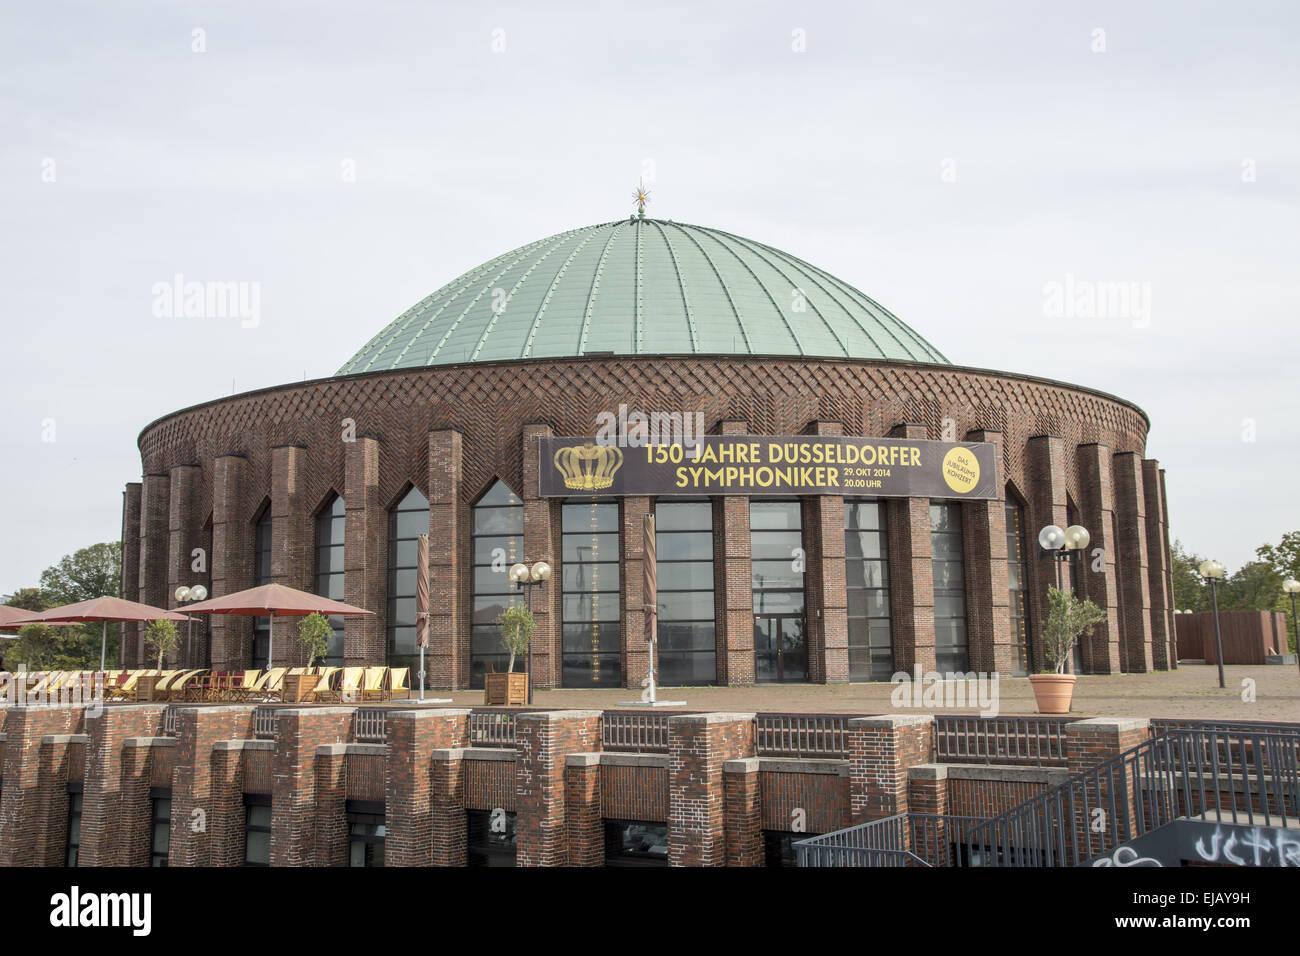 Tonhalle in Duesseldorf, Germany - Stock Image